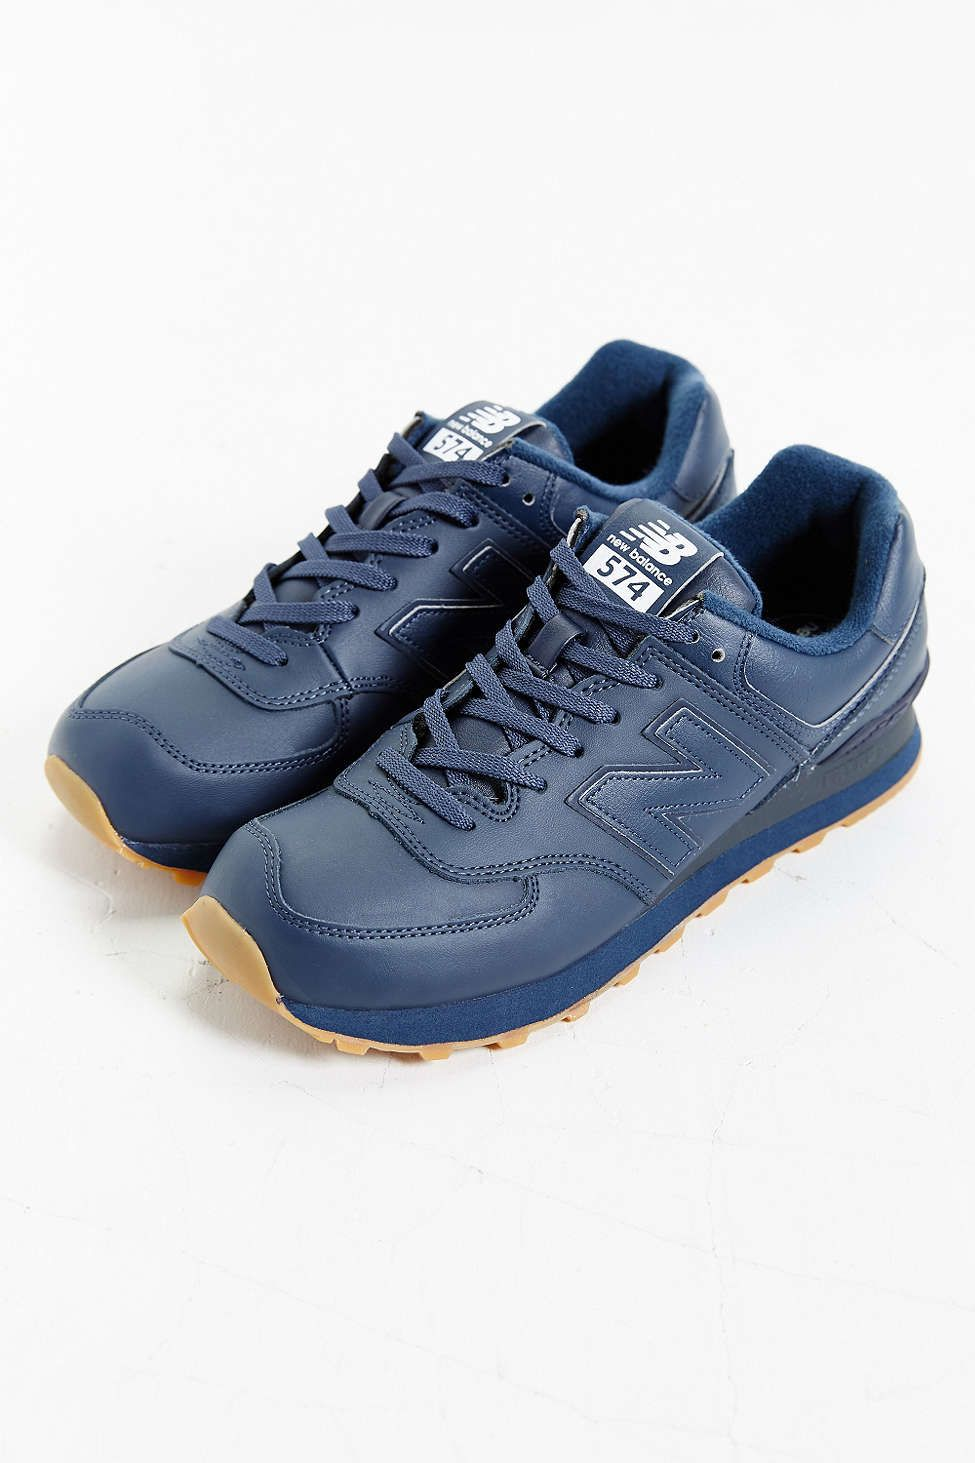 New Balance 574 Leather Gumsole Sneaker